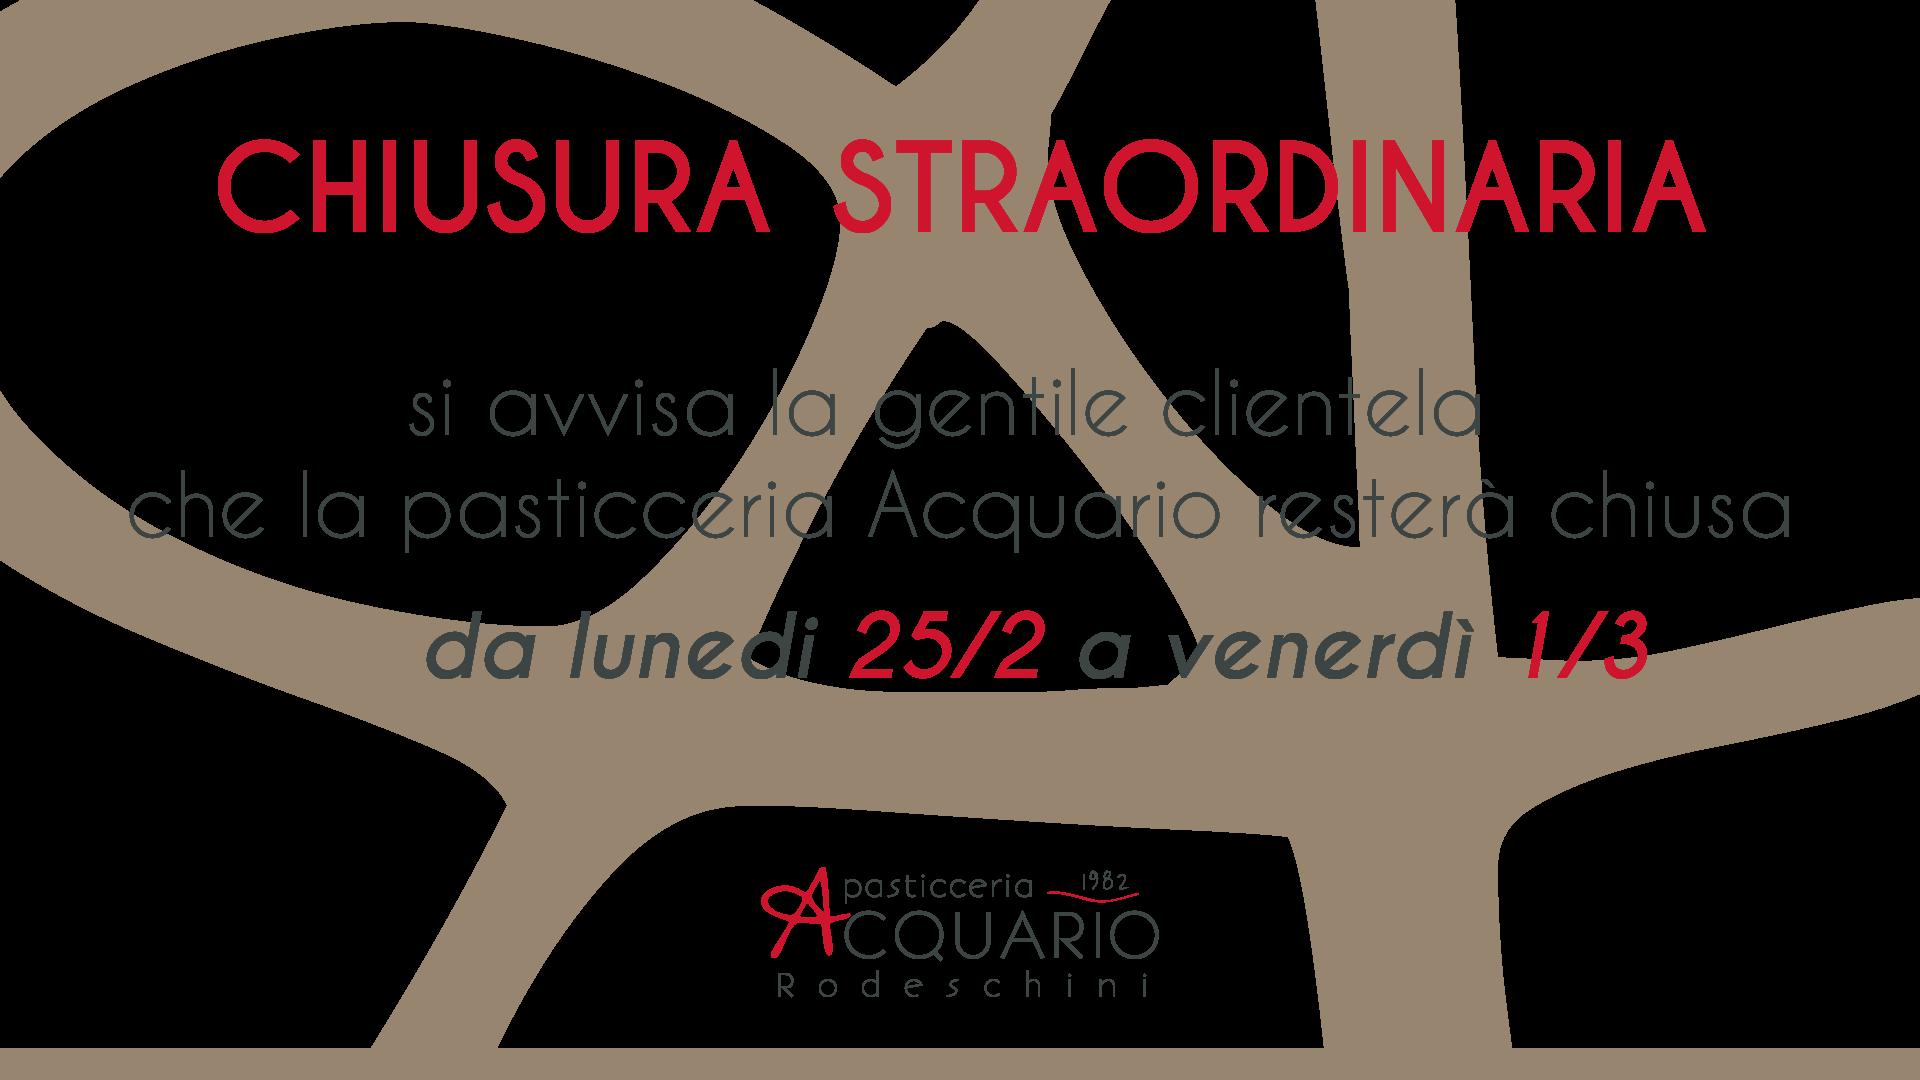 Chiusura straordinaria pasticceria acquario